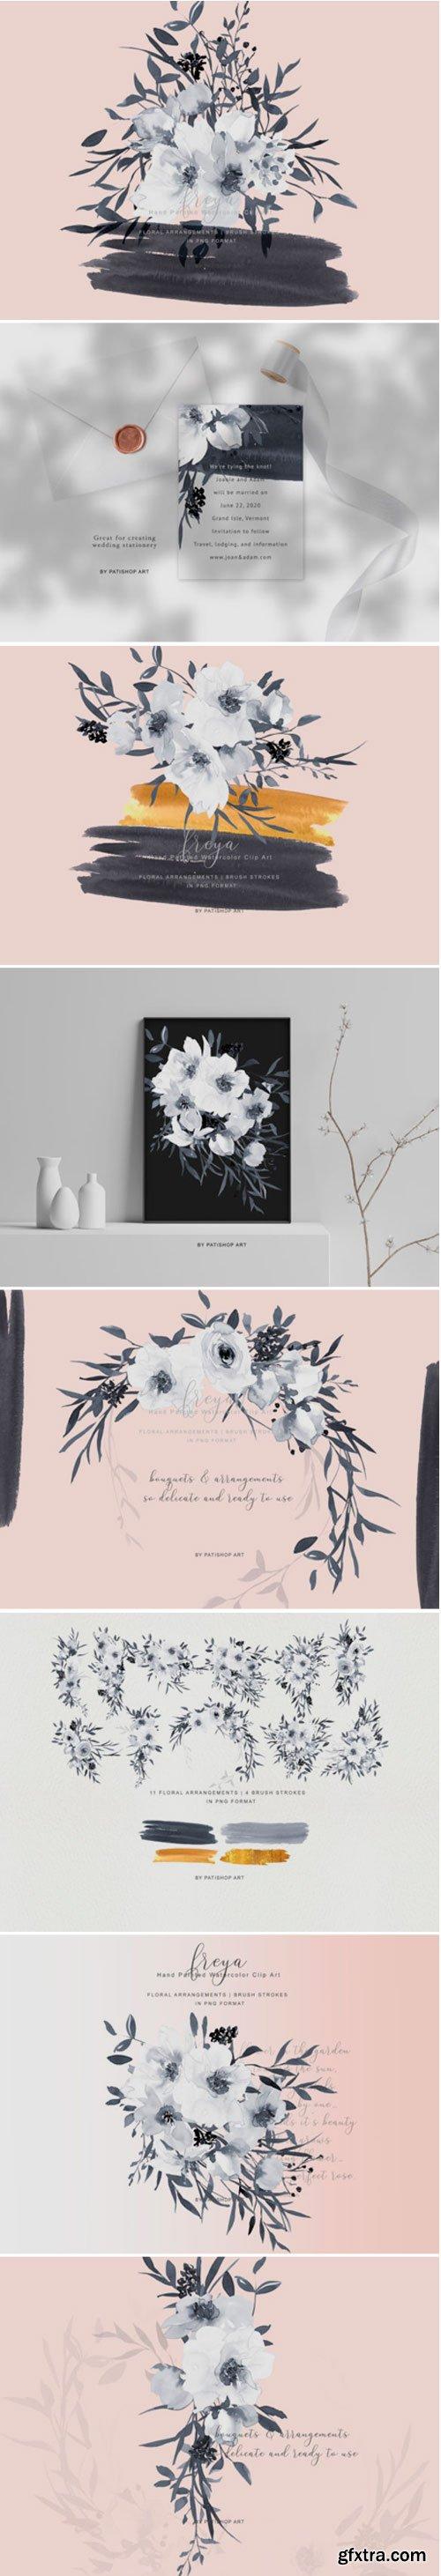 Elegant Gray & White Rose Bouquet Clipart 1409111